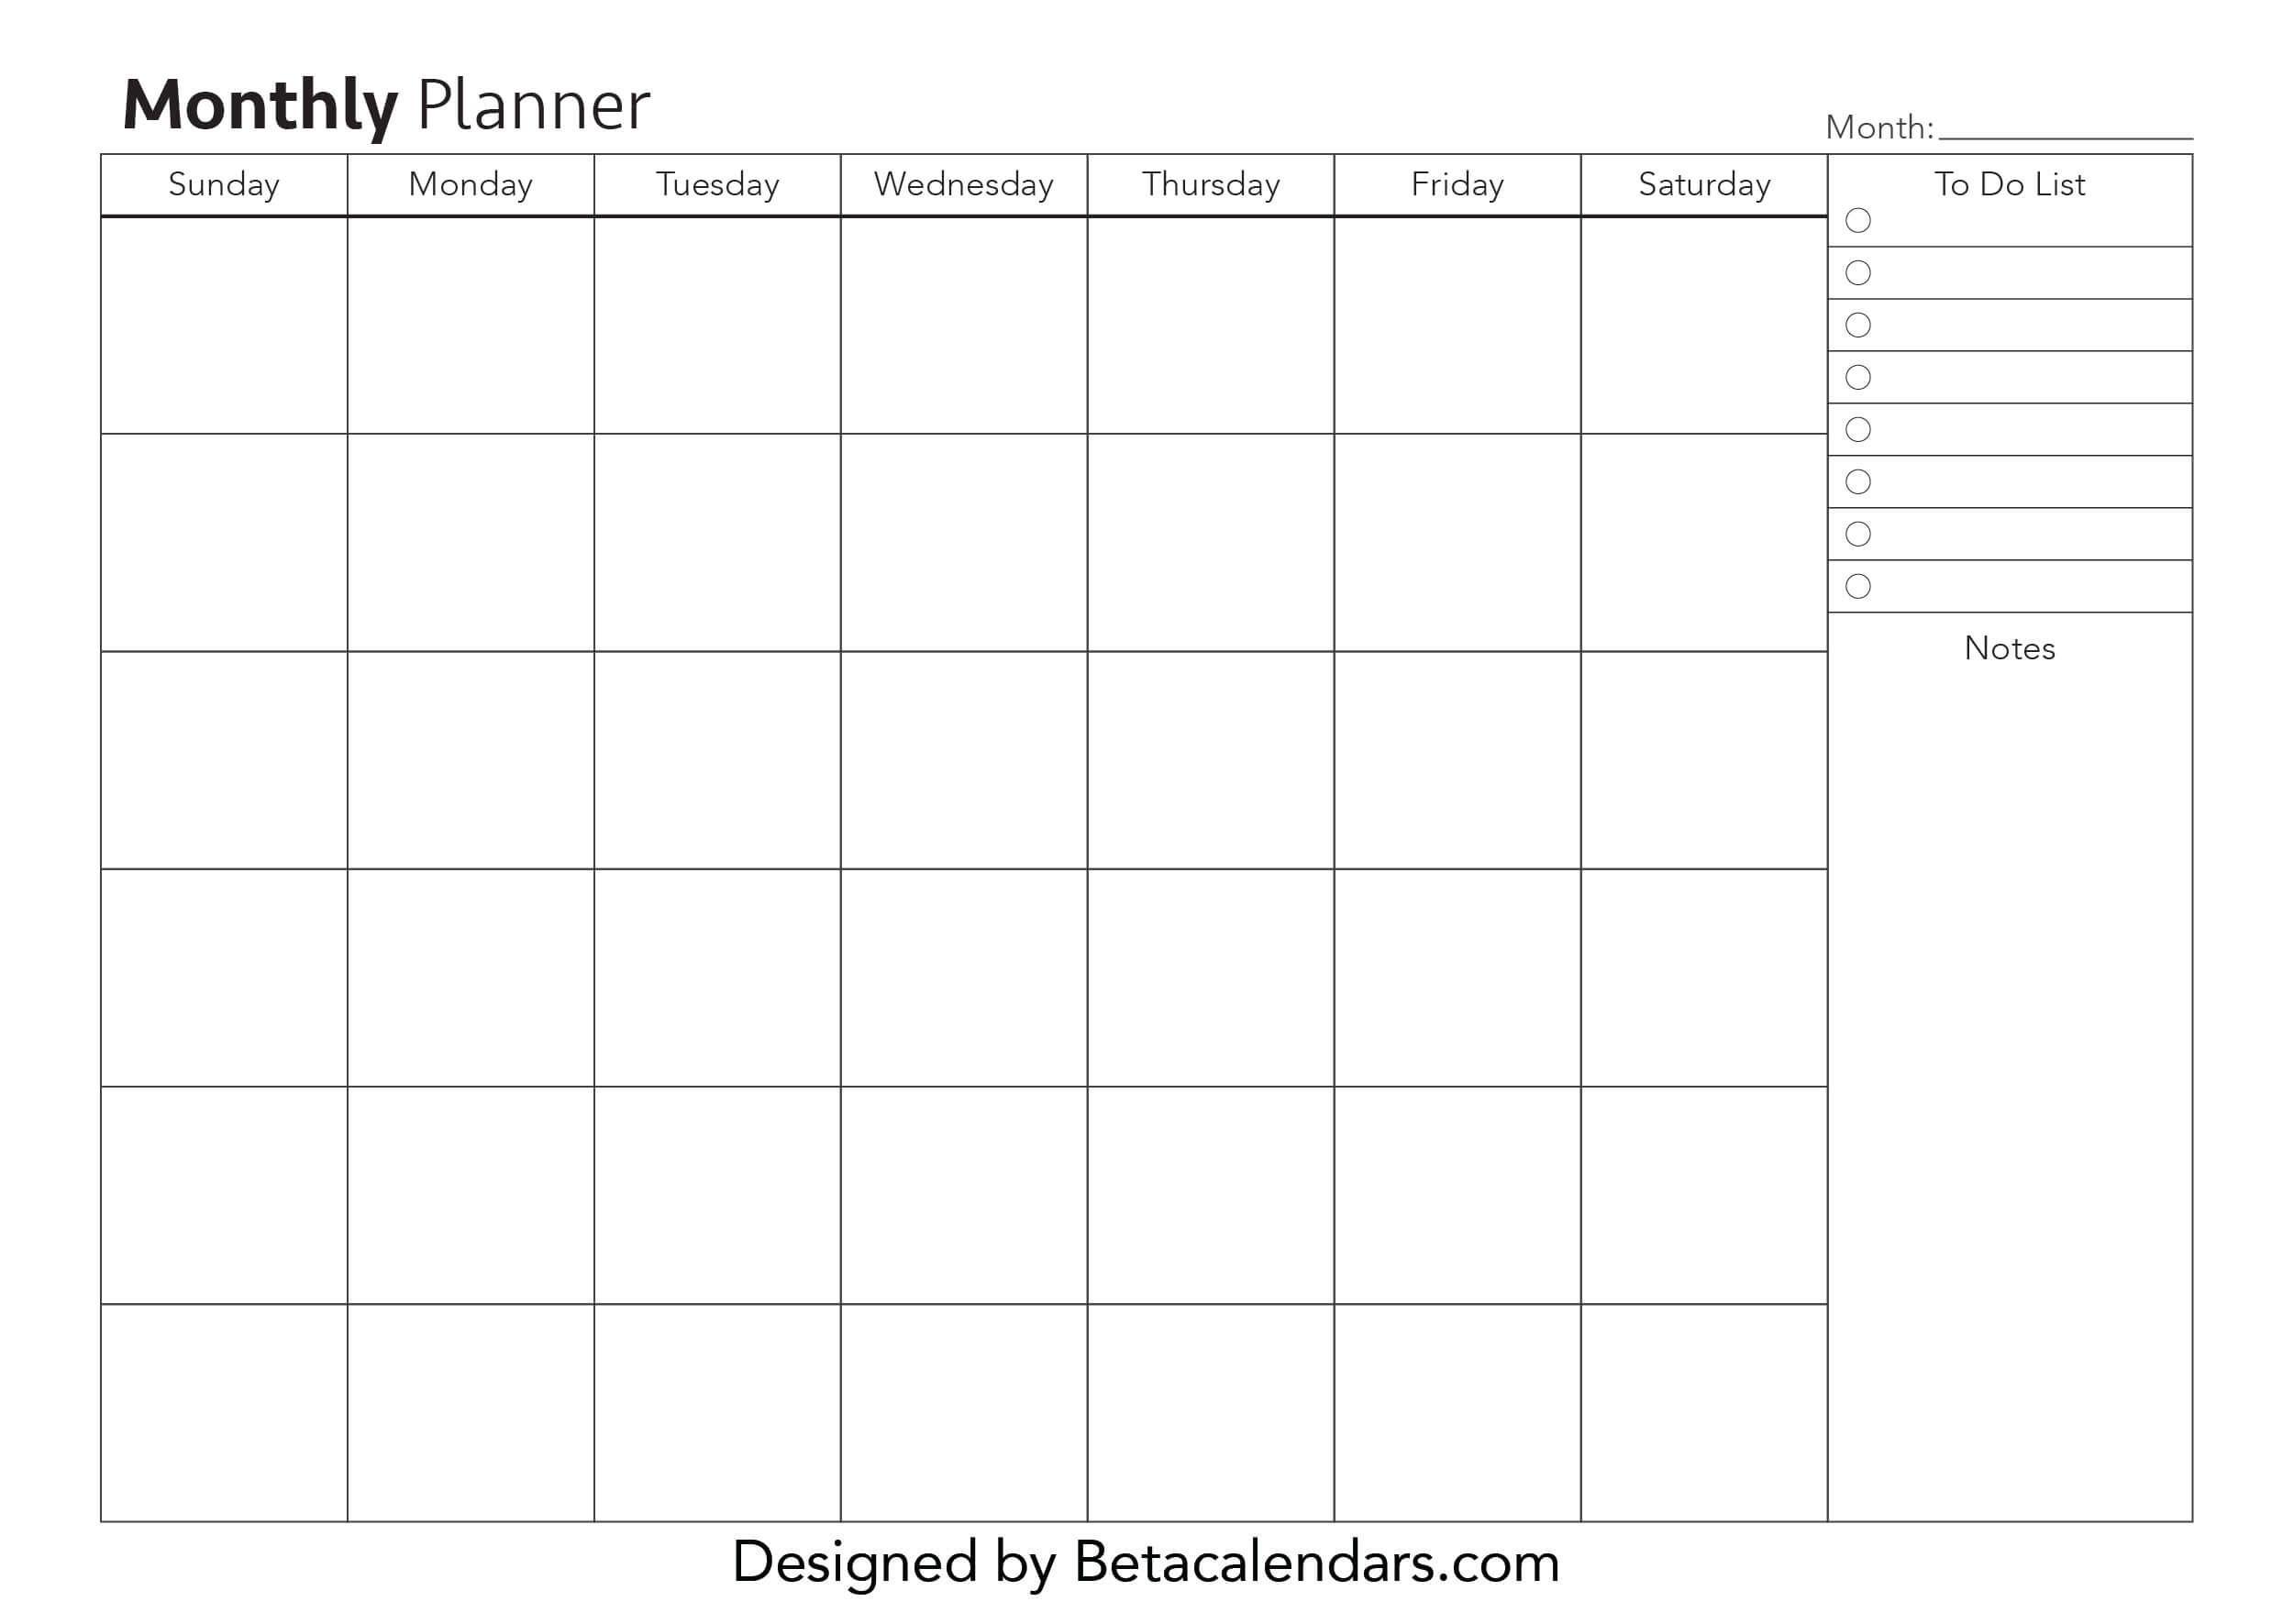 free printable monthly planner beta calendars